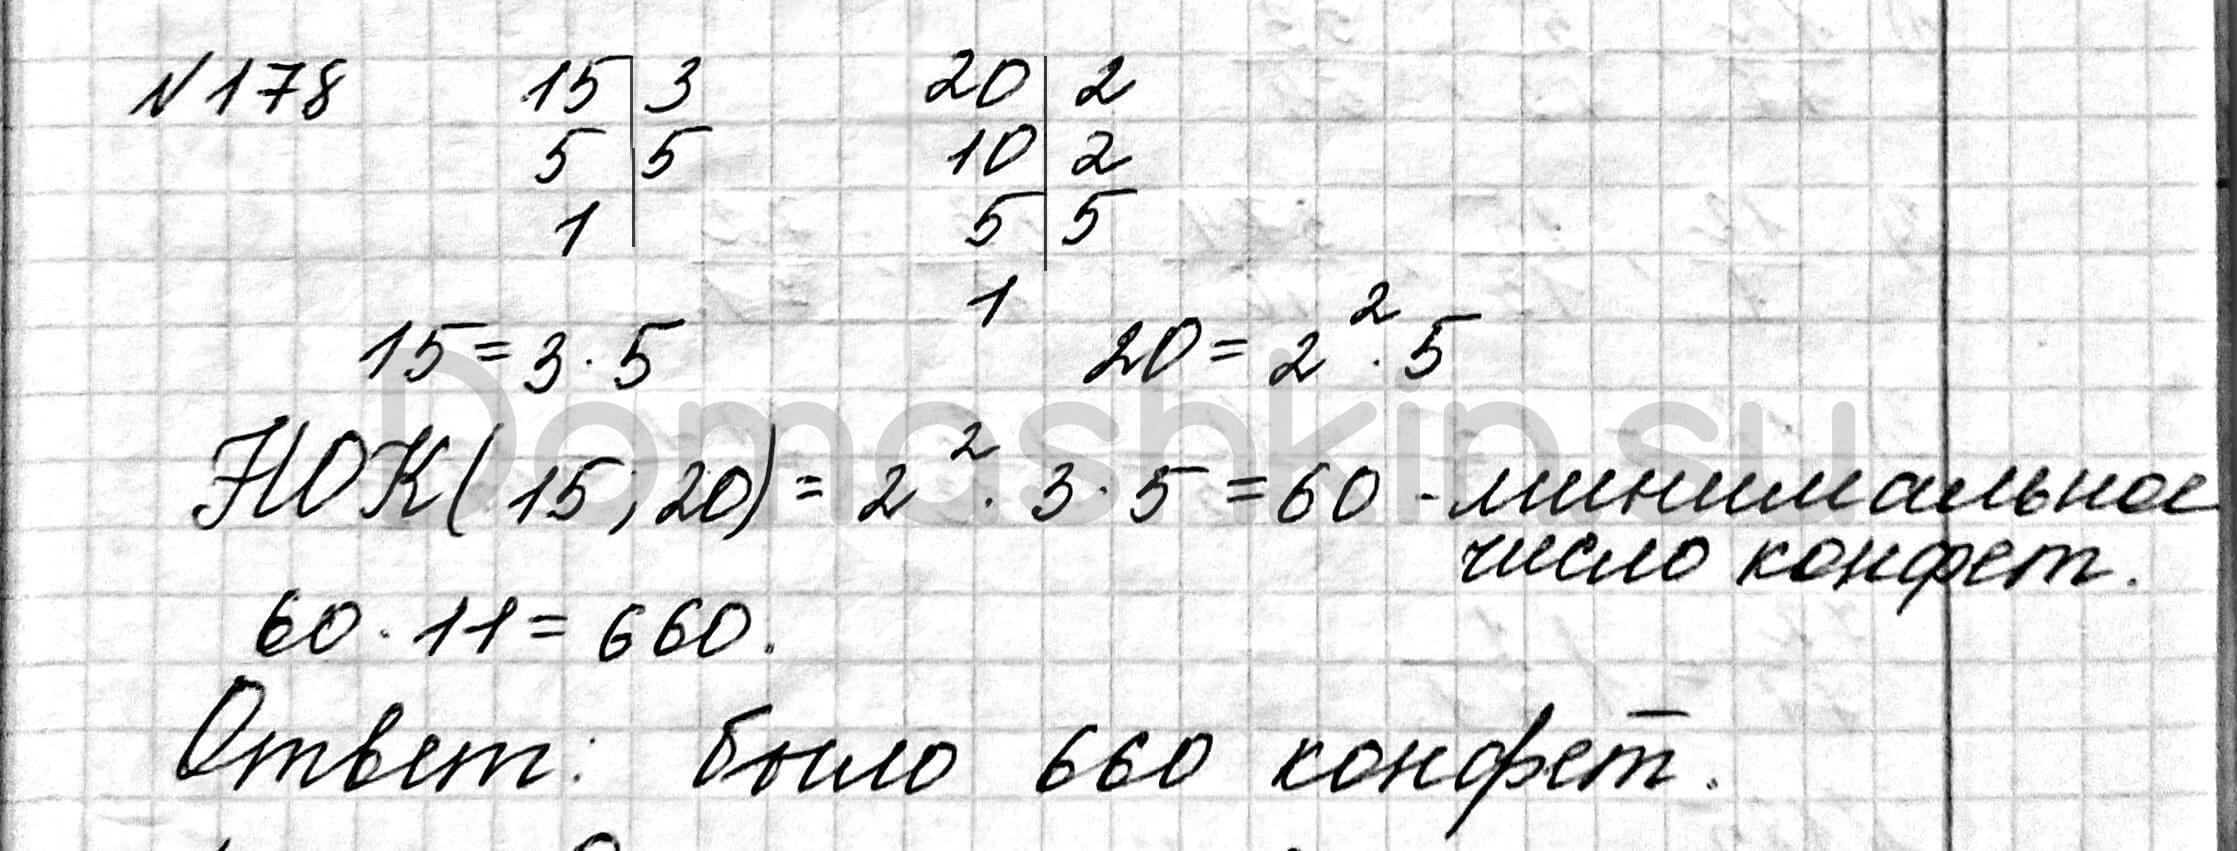 Математика 6 класс учебник Мерзляк номер 178 решение